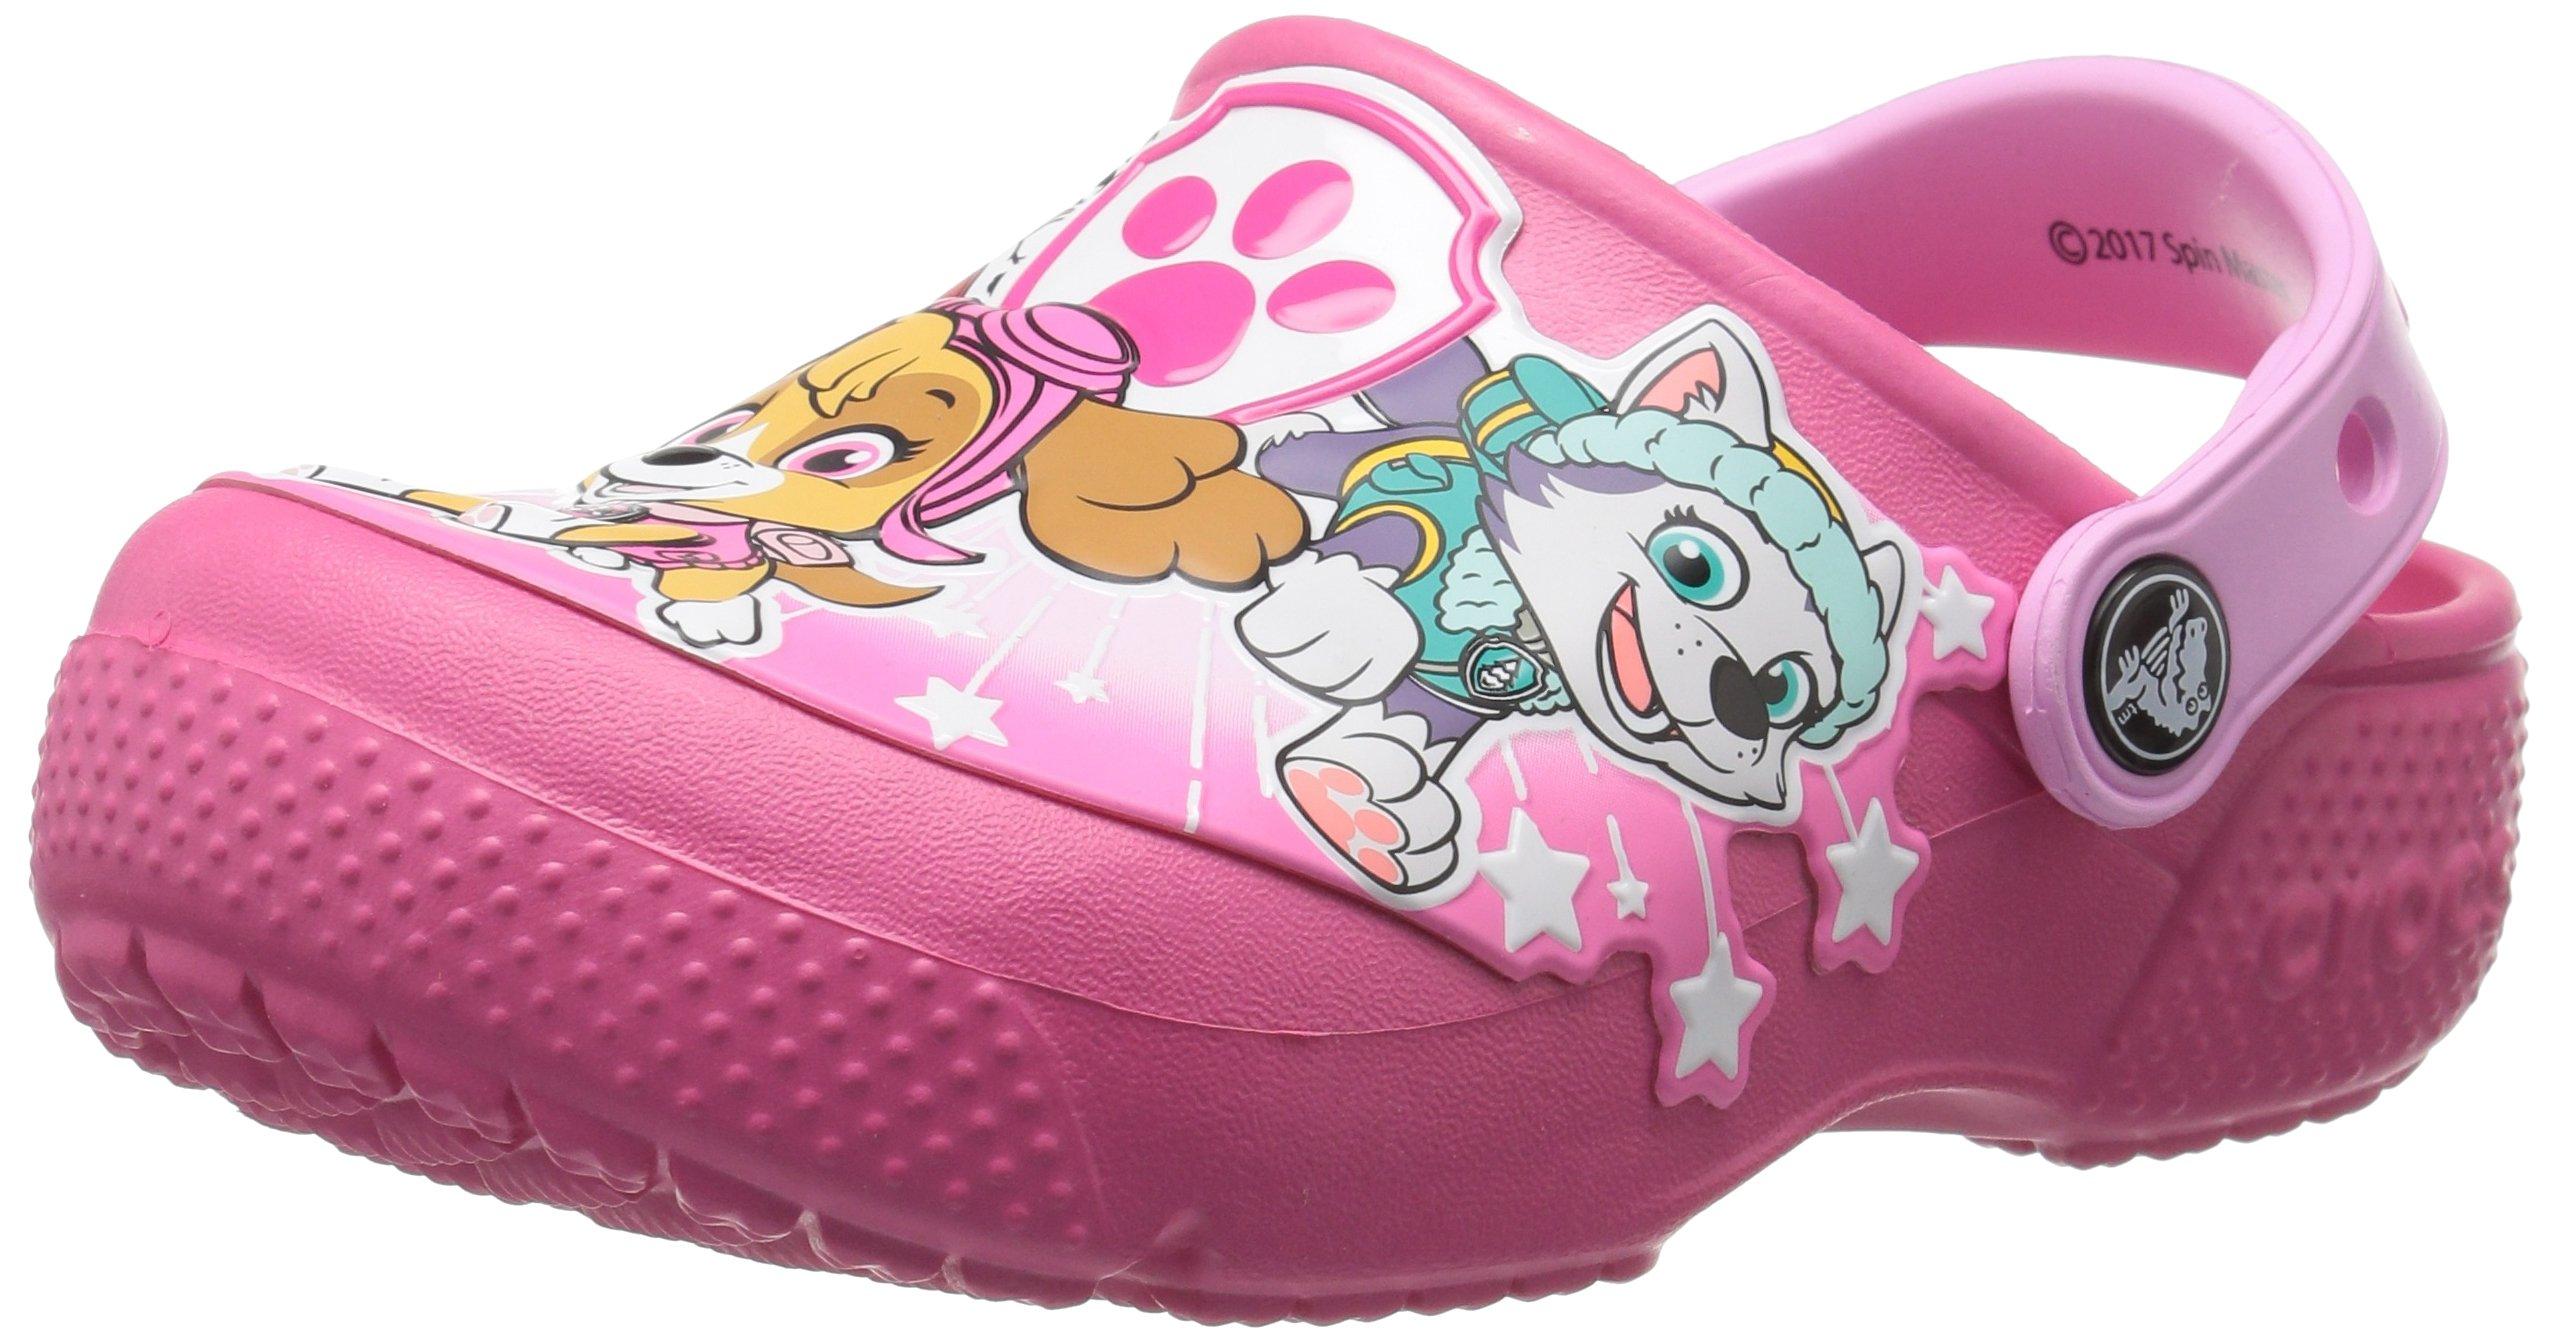 Crocs Girls' Crocsfunlab Pawpatrol Clog, Vibrant Pink, 9 M US Toddler